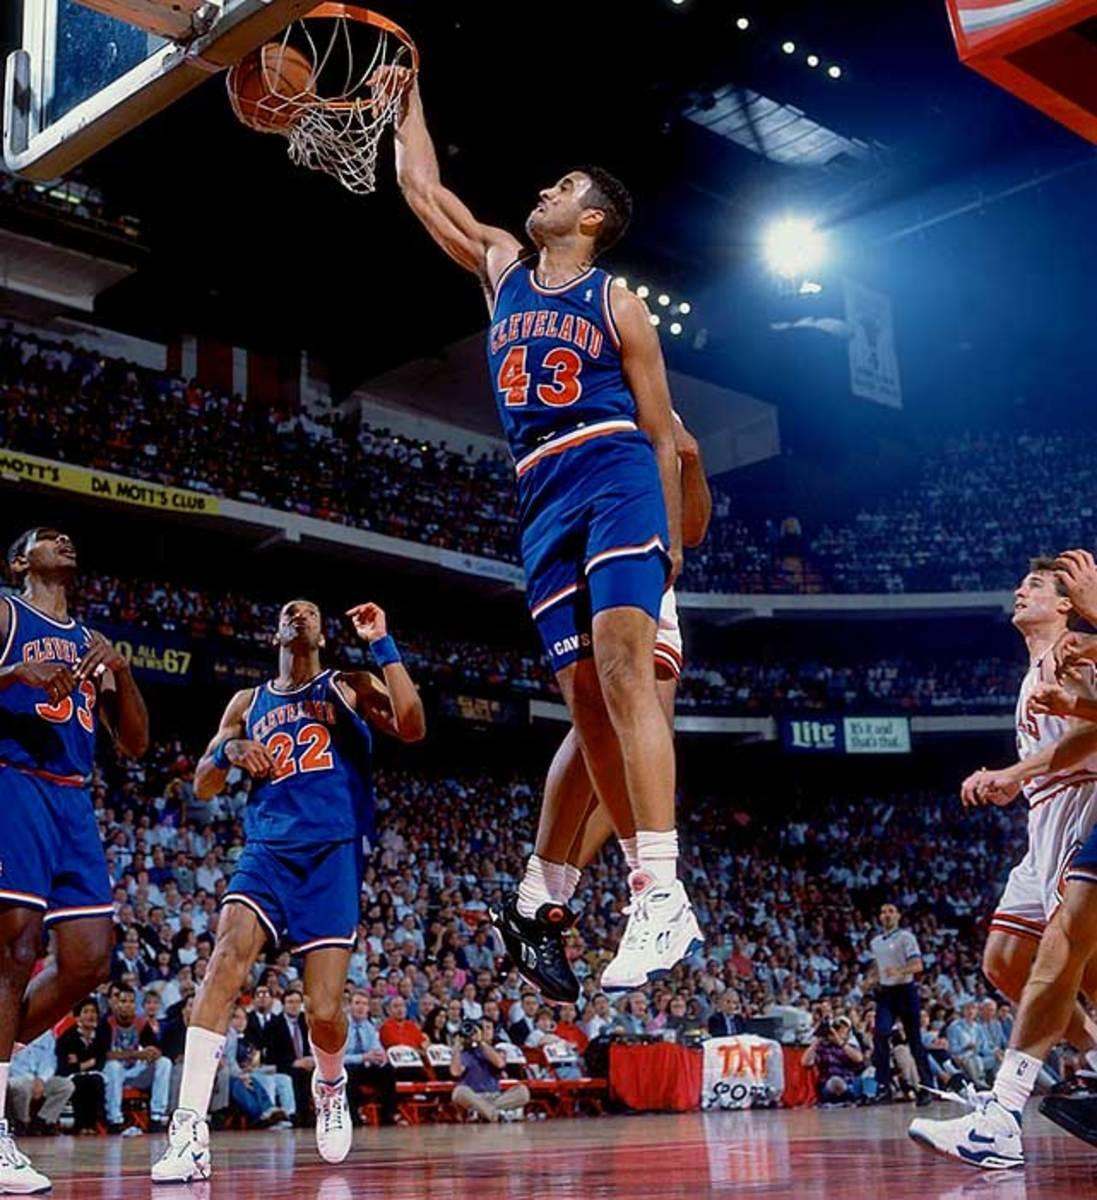 1986: Brad Daugherty